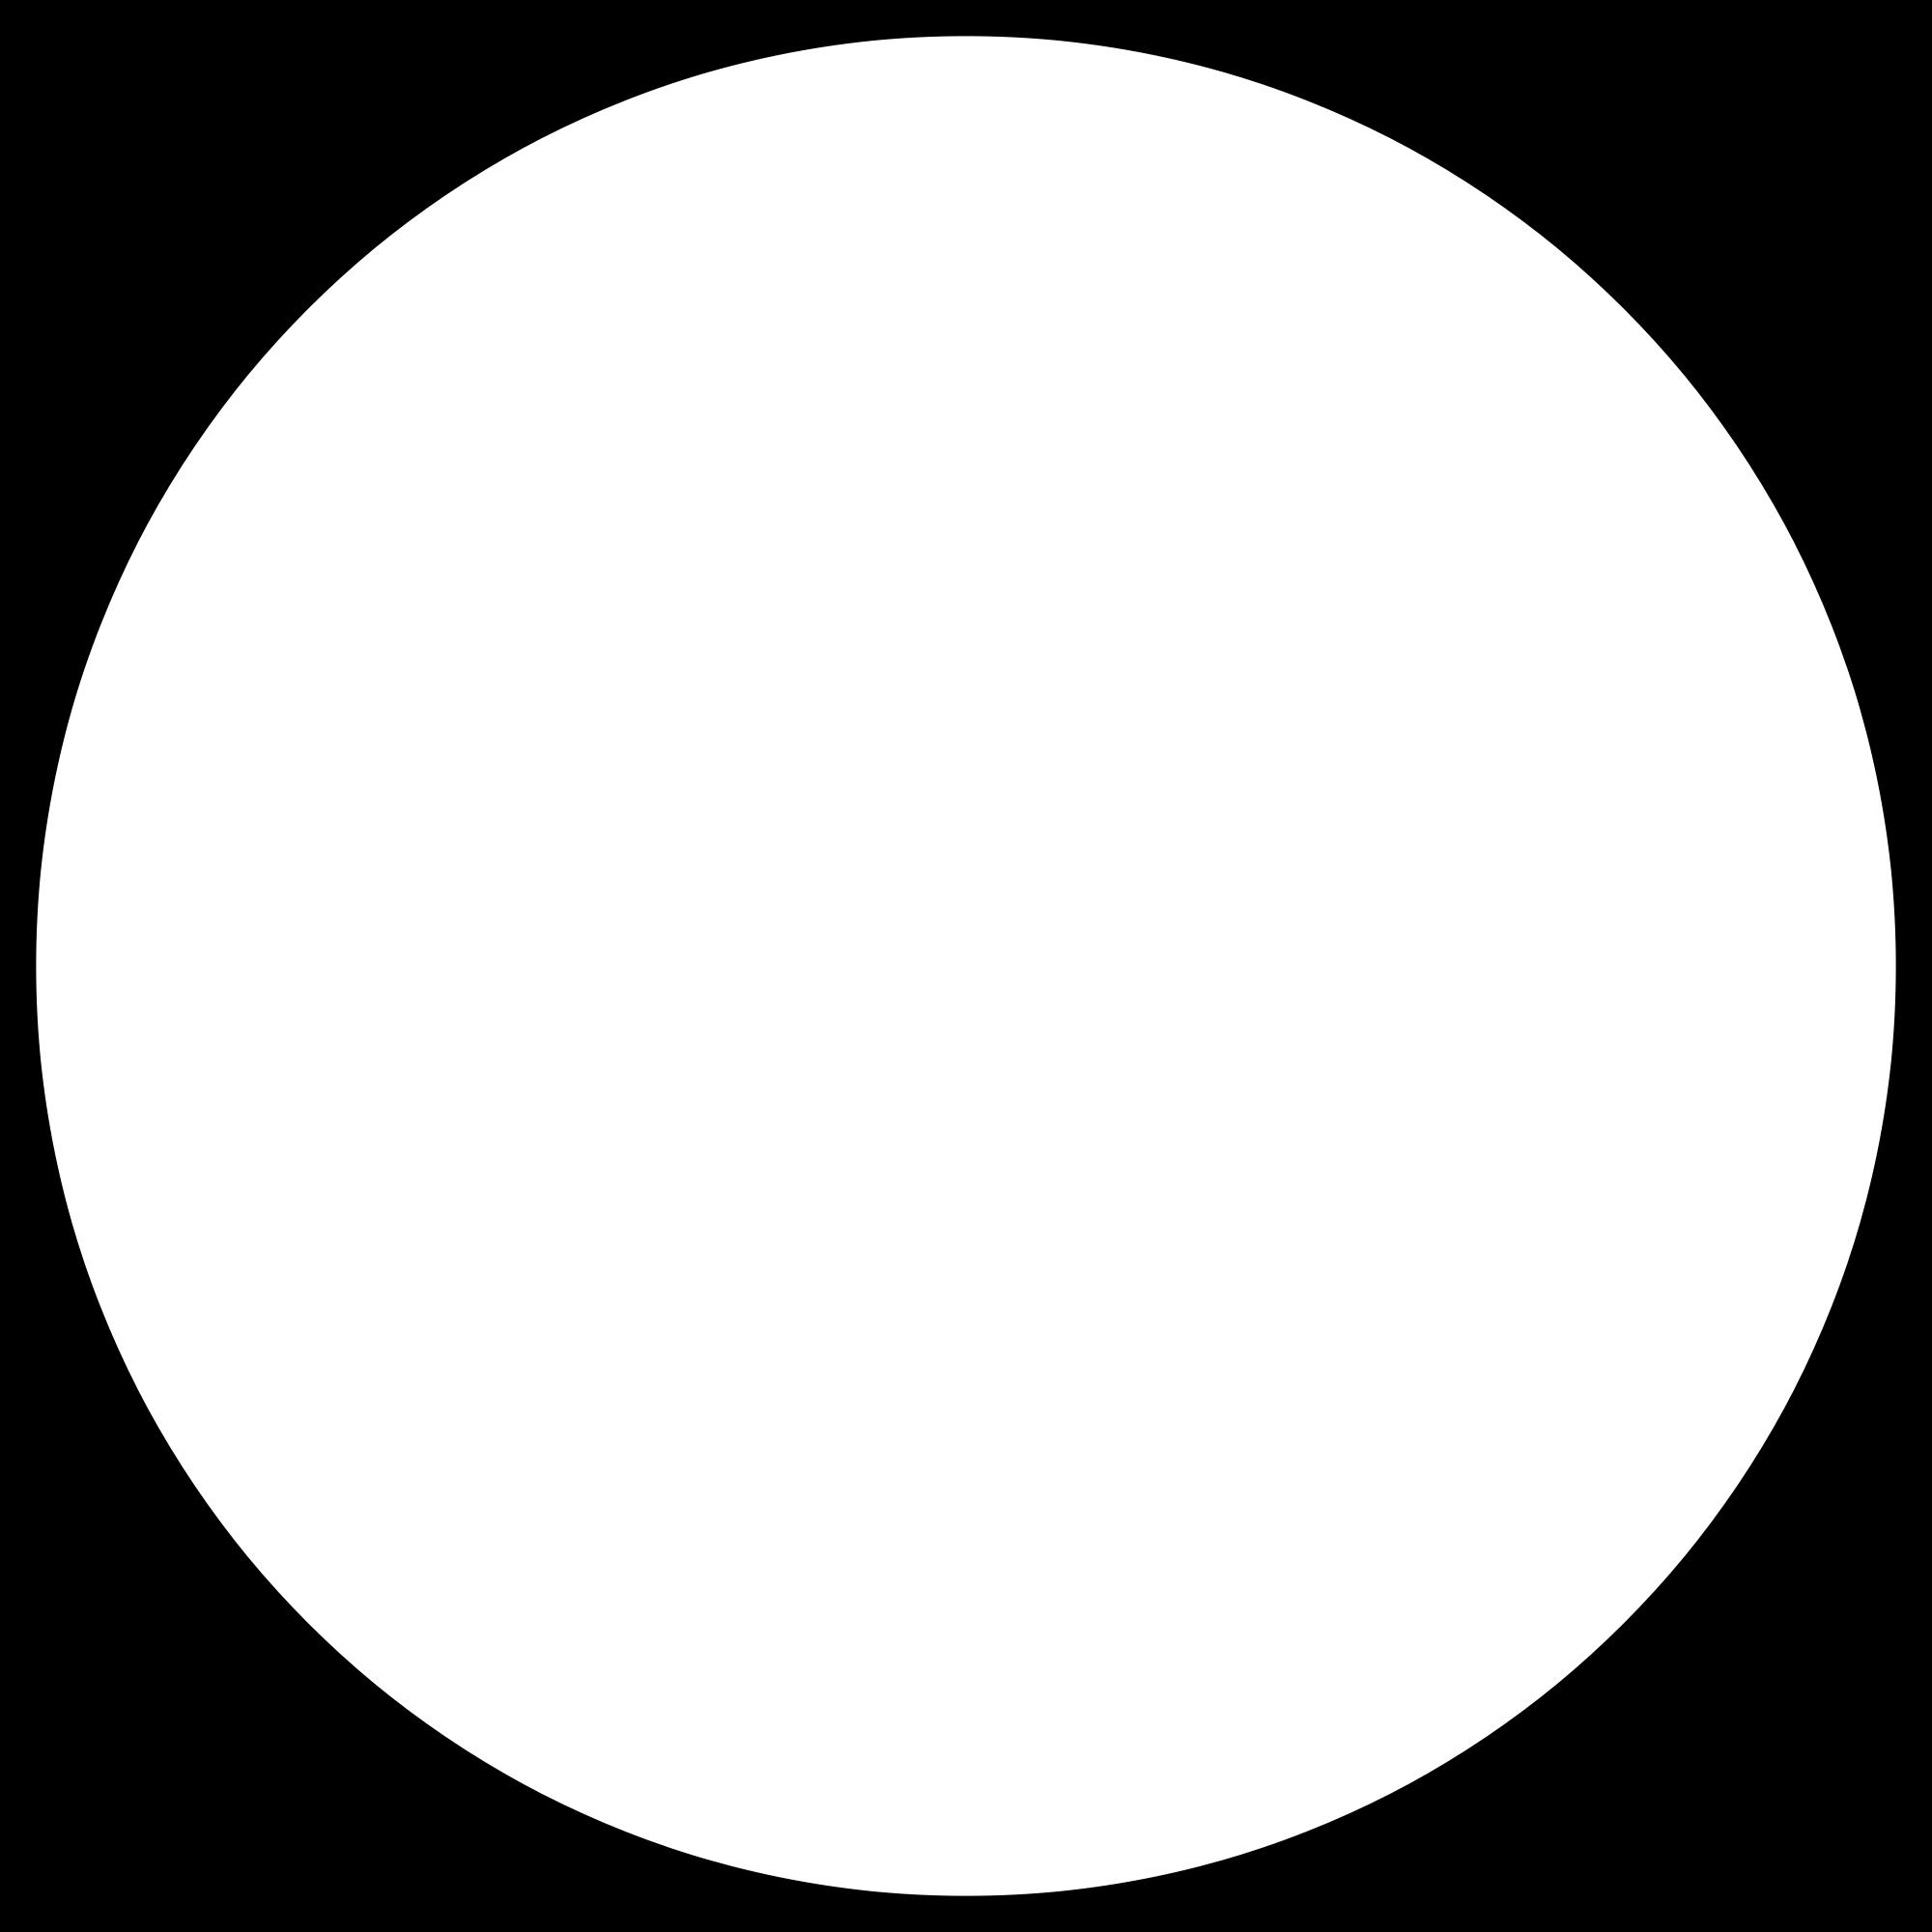 jpg black and white Google image